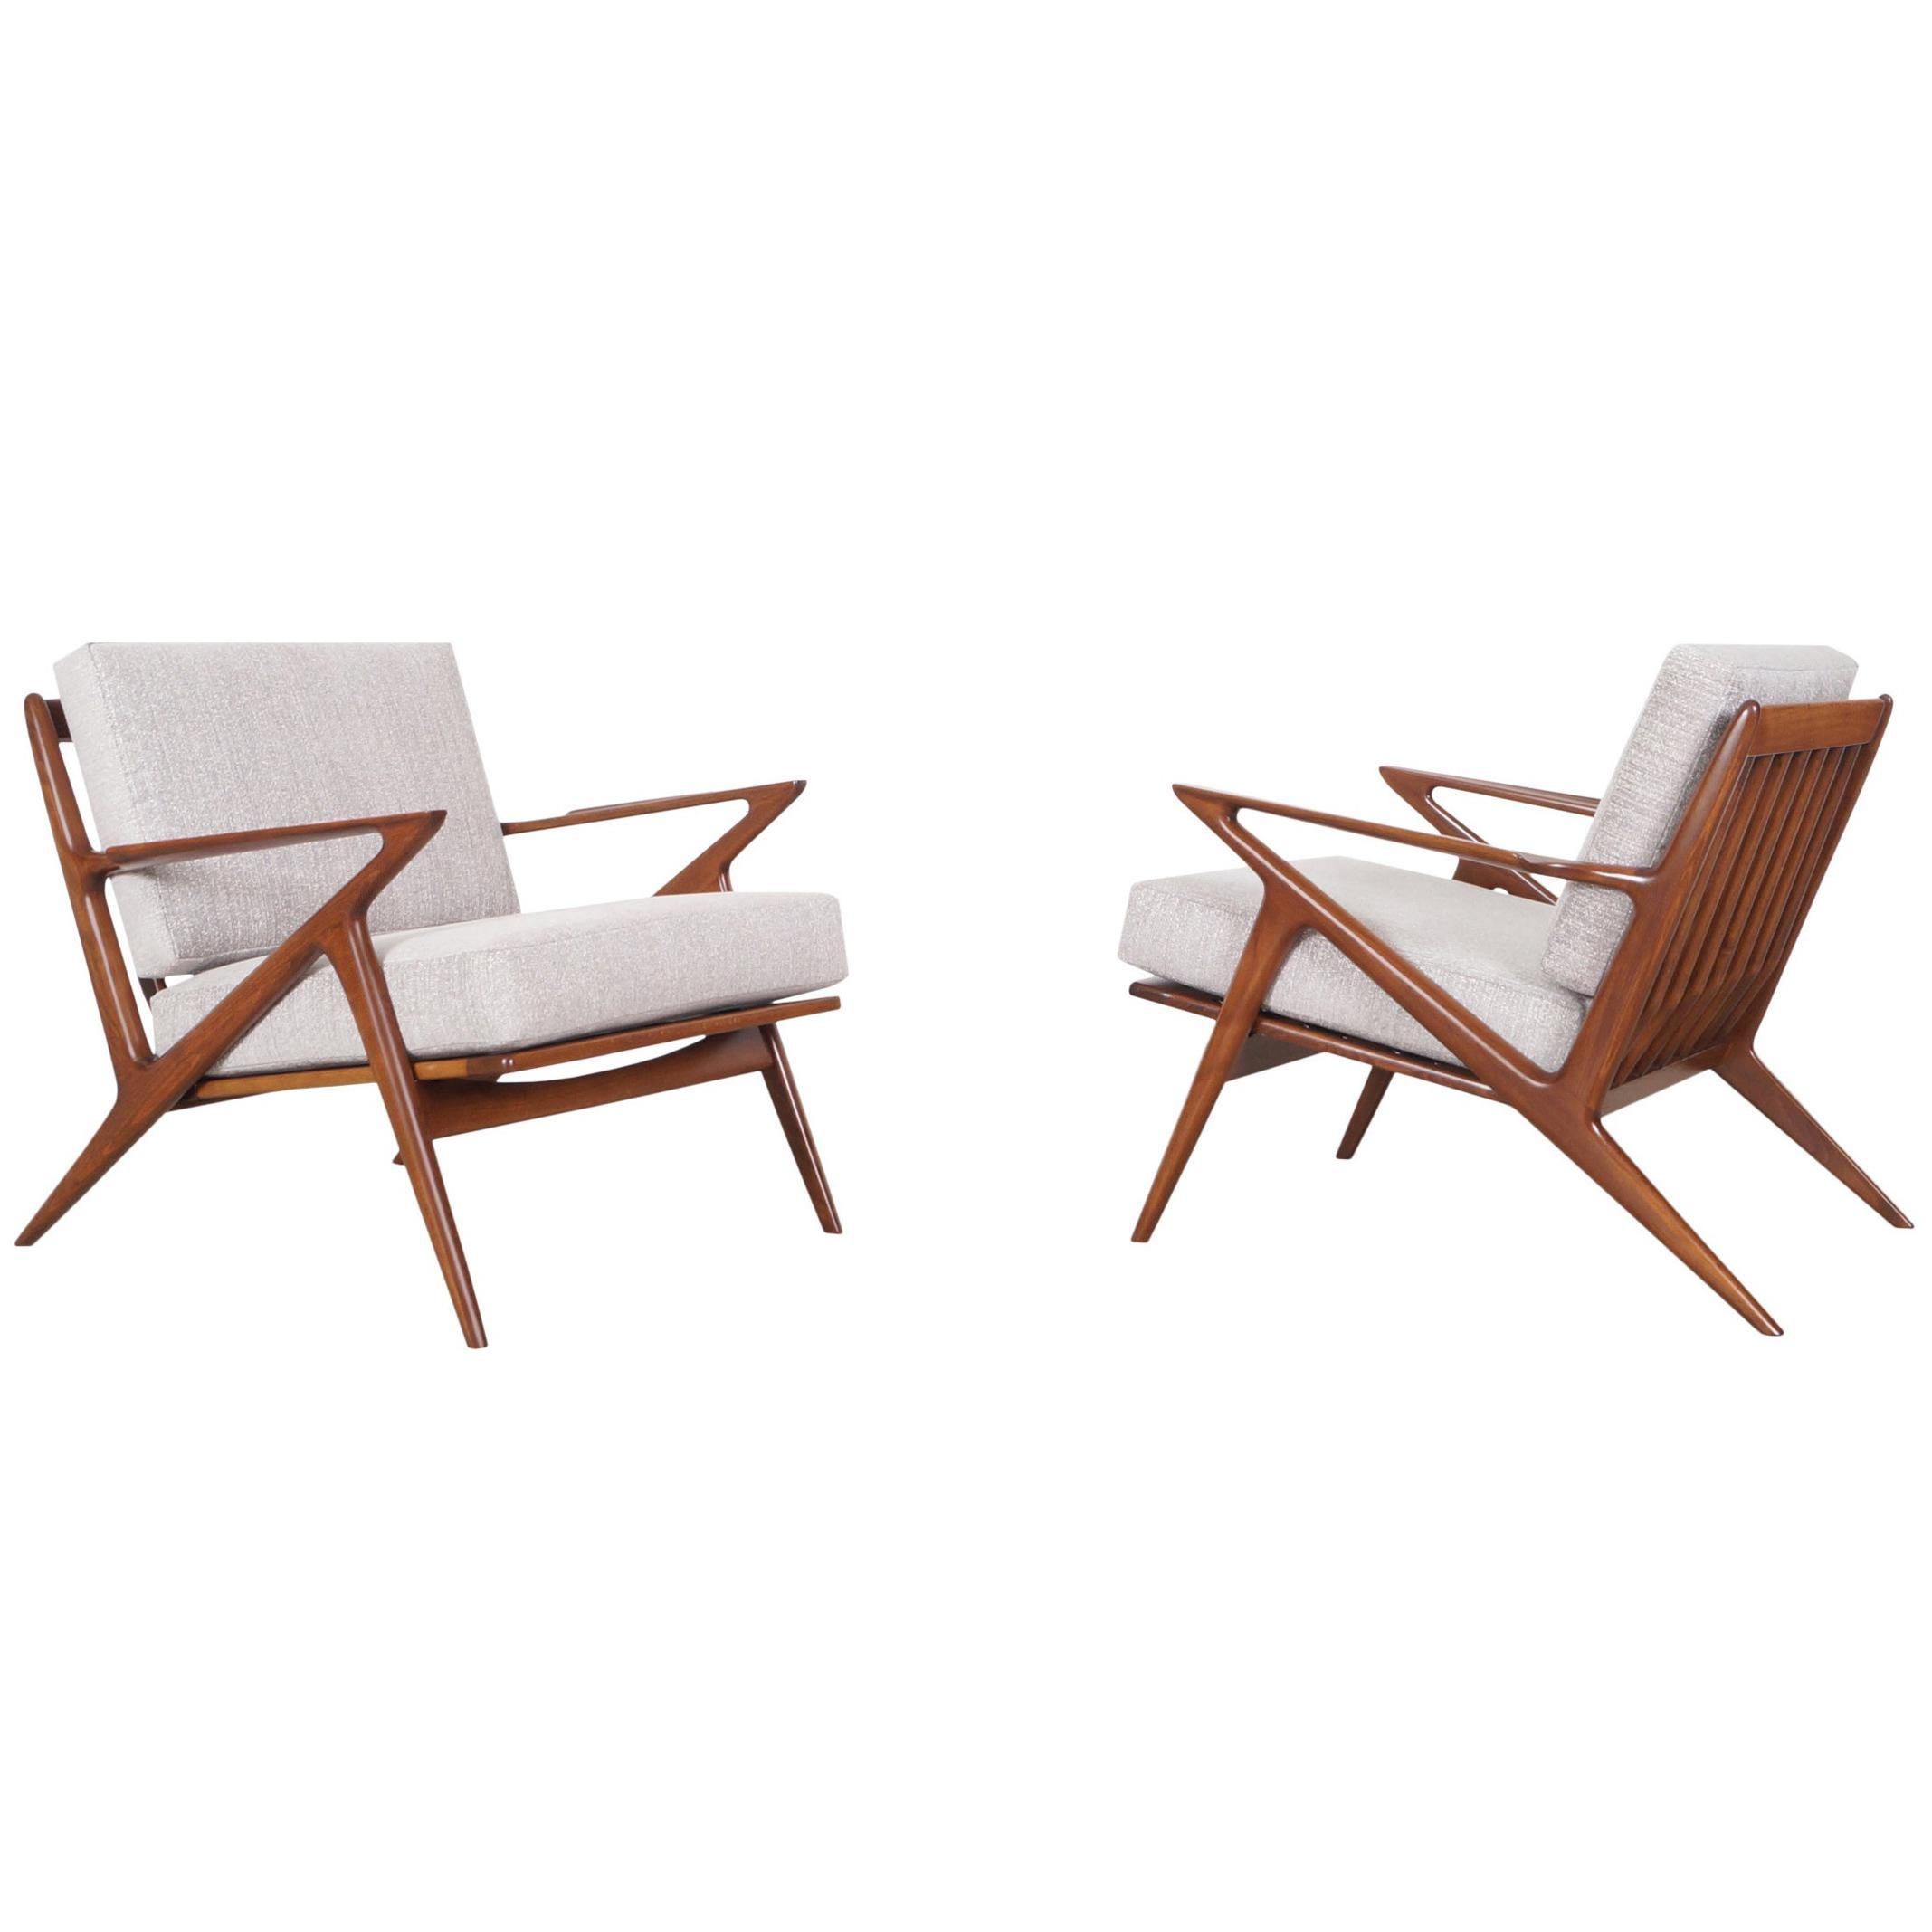 "Danish Modern ""Z"" Lounge Chairs by Poul Jensen for Selig"